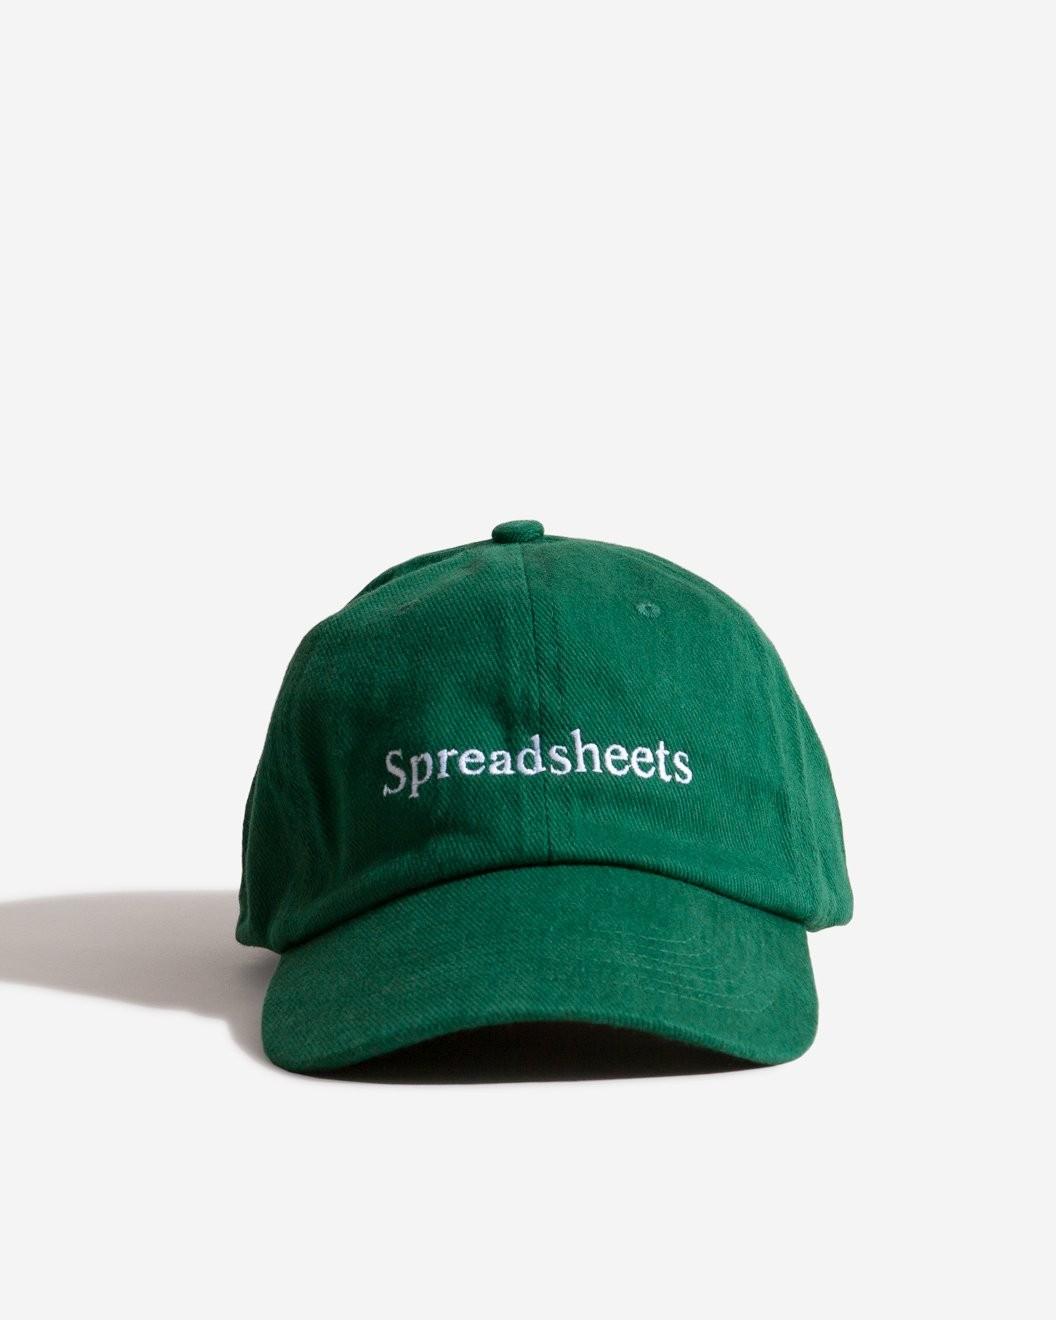 ps_spreadsheets_hat.jpg?v=1545253788